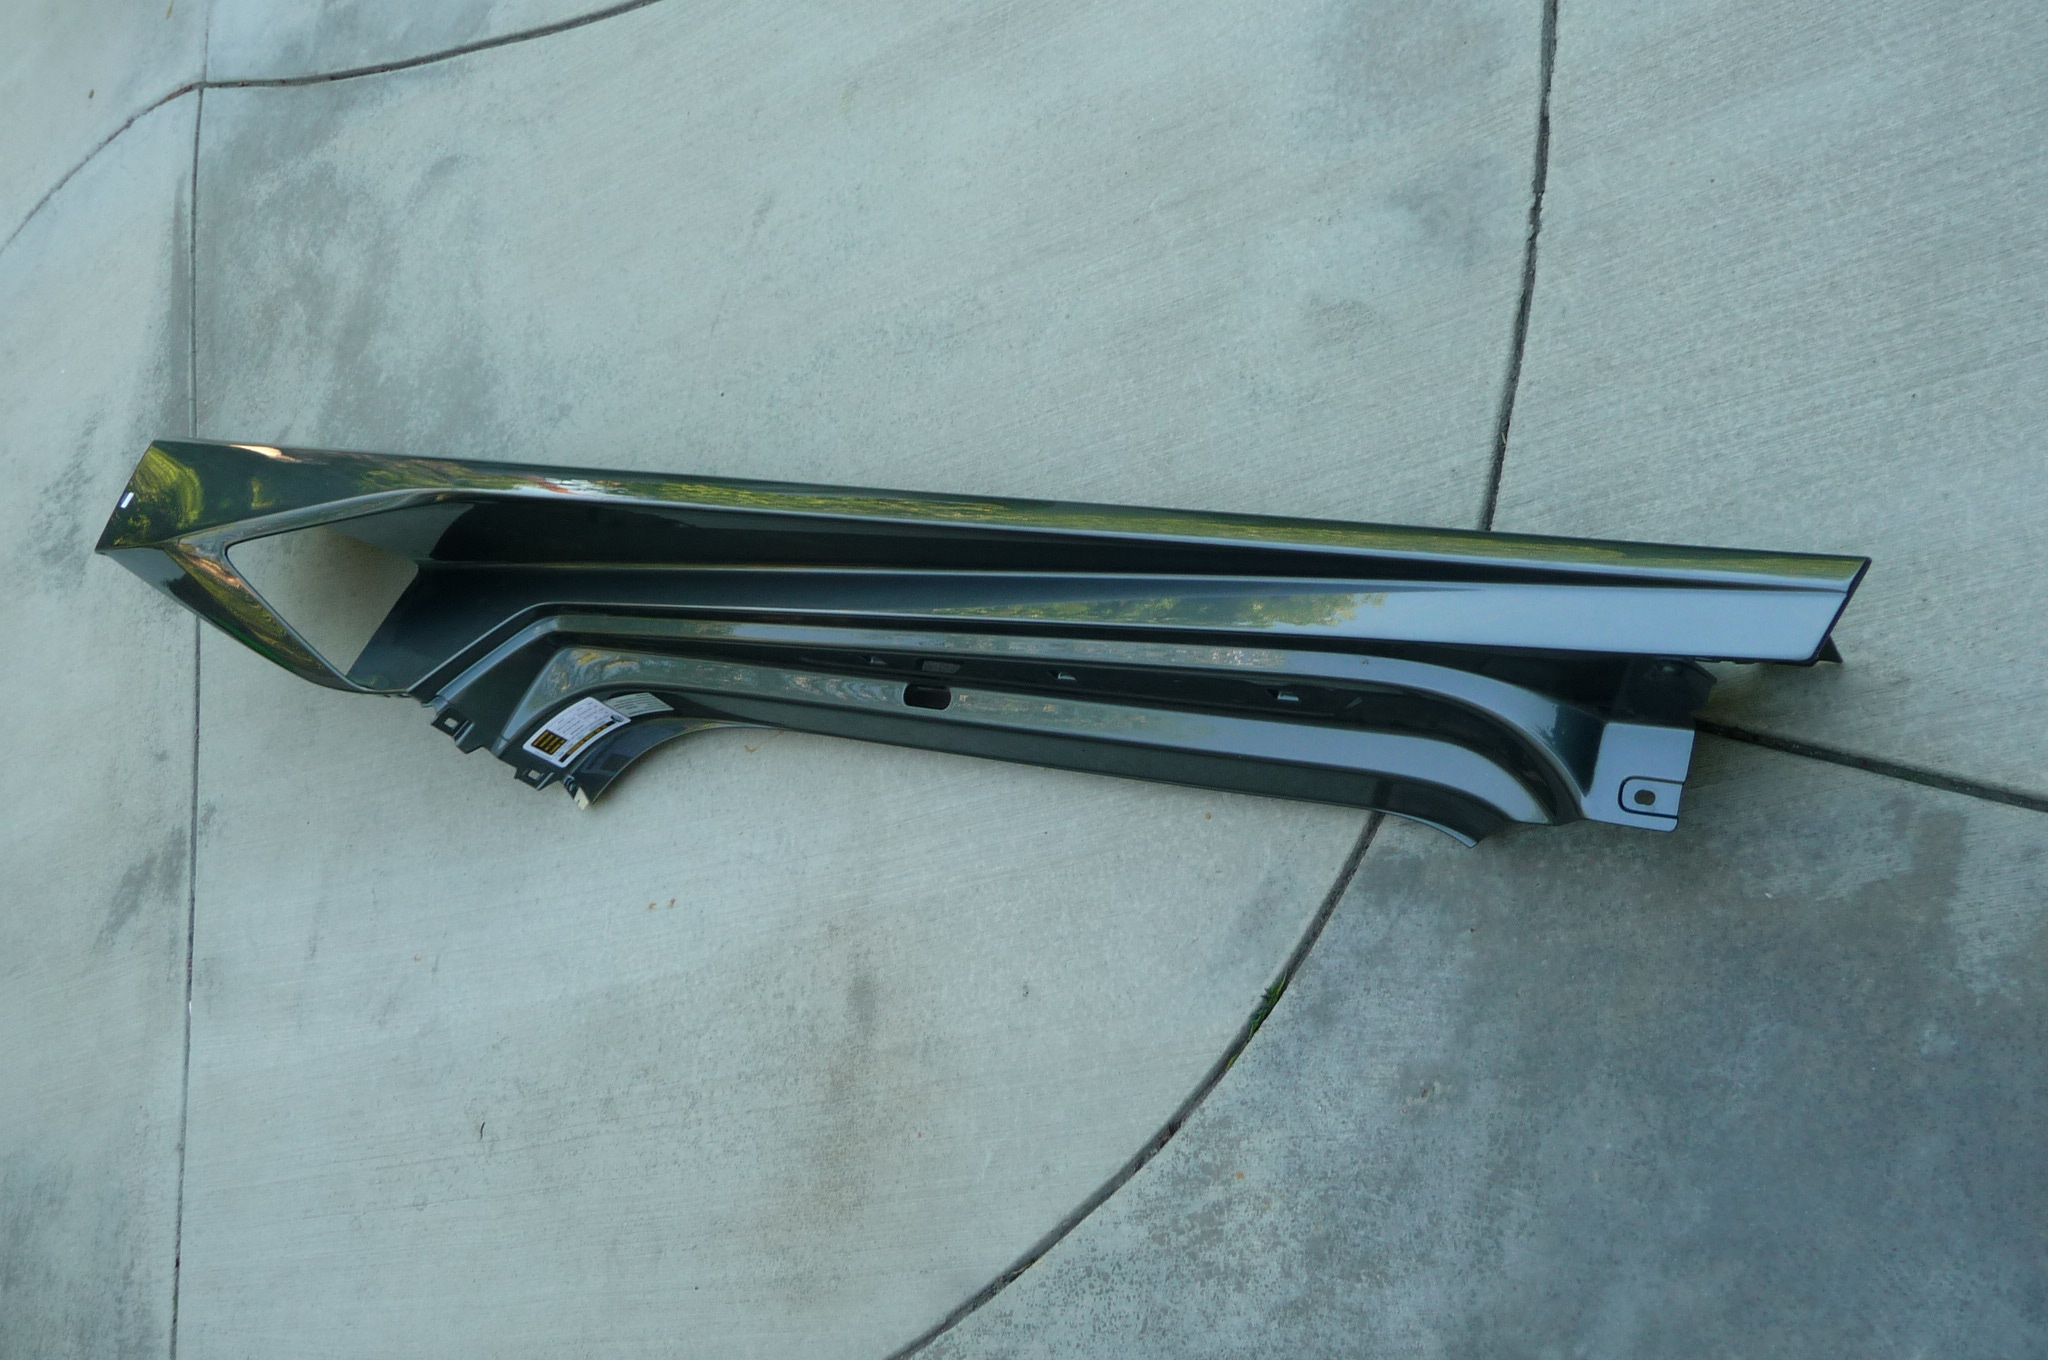 Lamborghini Huracan LP 610-4 Front Driver Rocker Cover Side Member 4T0898307, 4T0853113C OEM OE